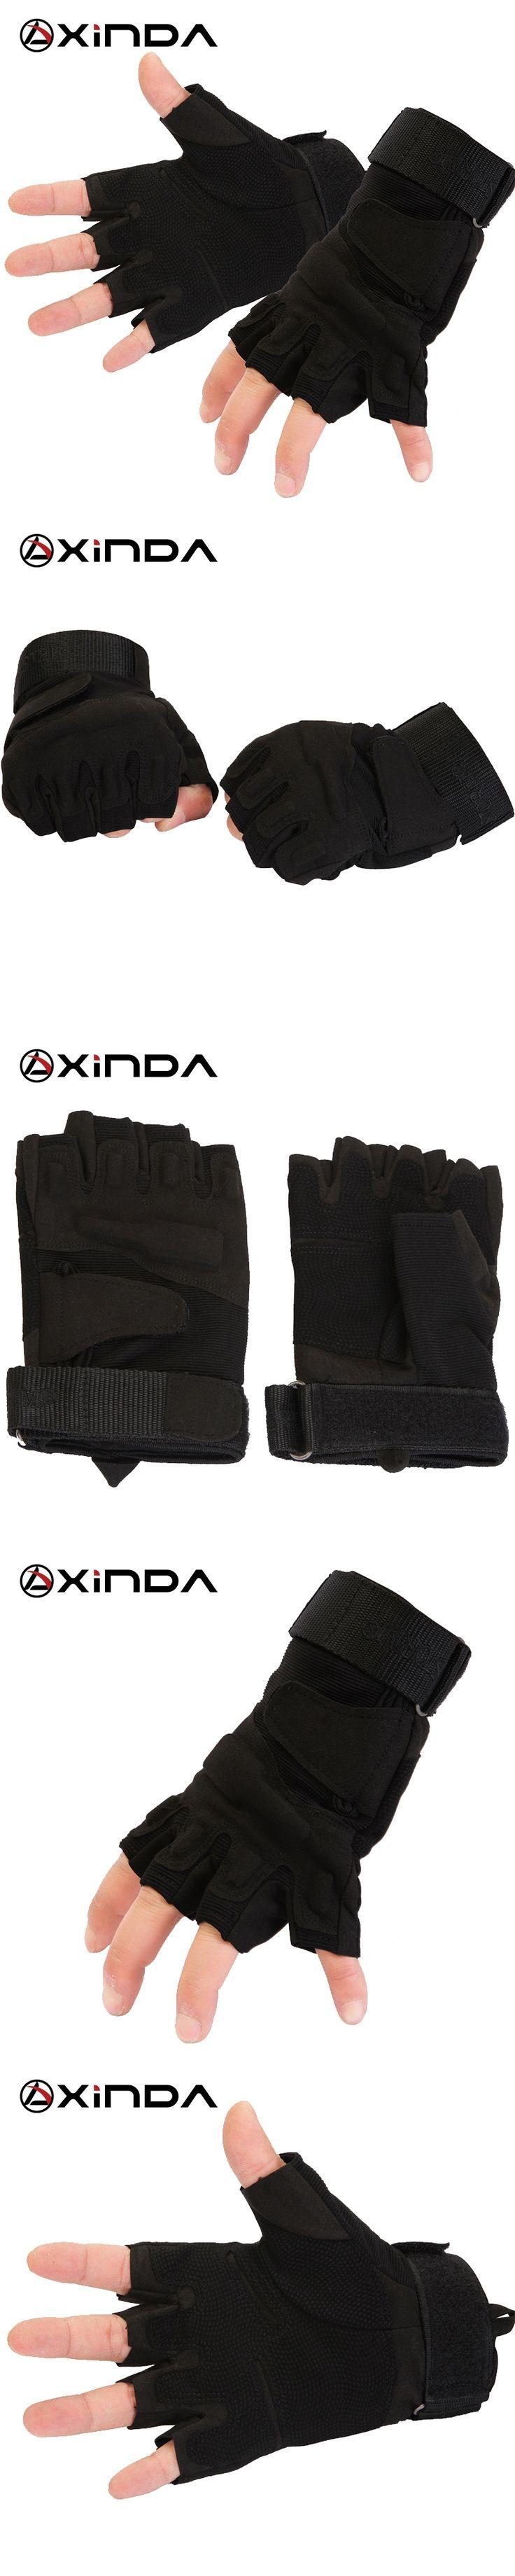 Top Quality XINDA professional Outdoor Sports Half Finger Tatics Gloves Rock Climb Downhill Hiking Riding Anti Slip gloves